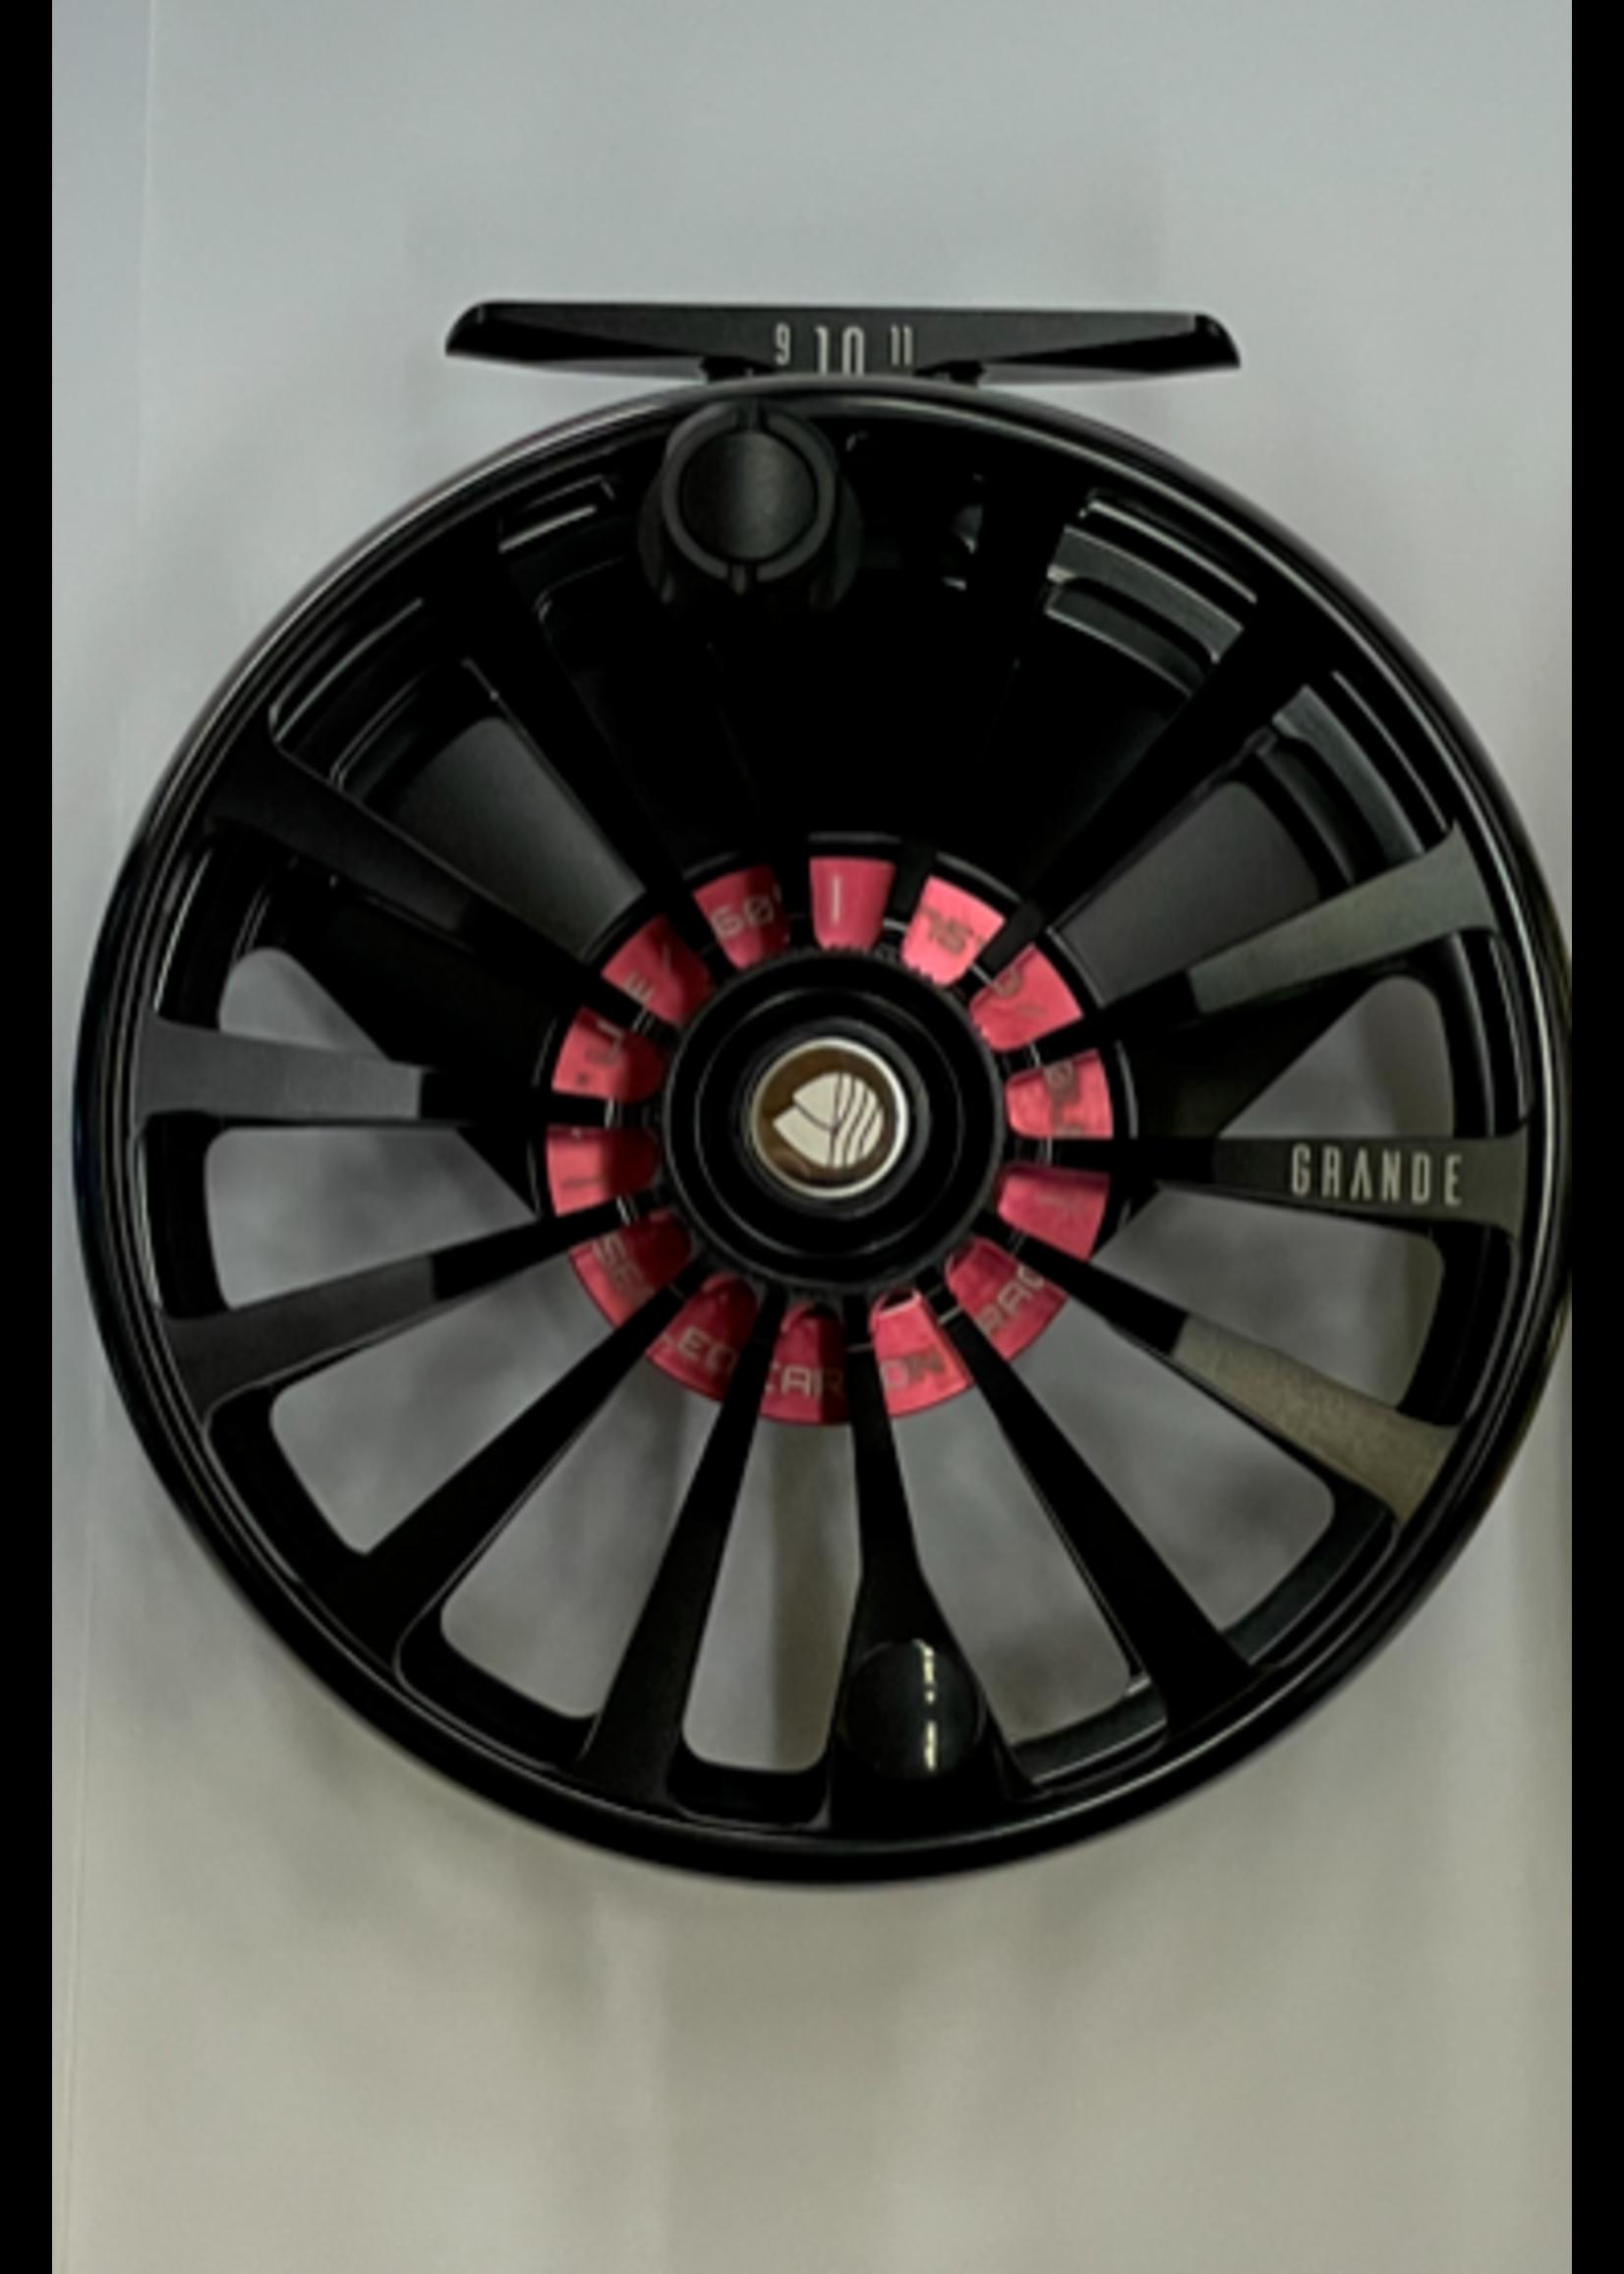 Reddington Grande Fly Reel Black 9/10/11wt